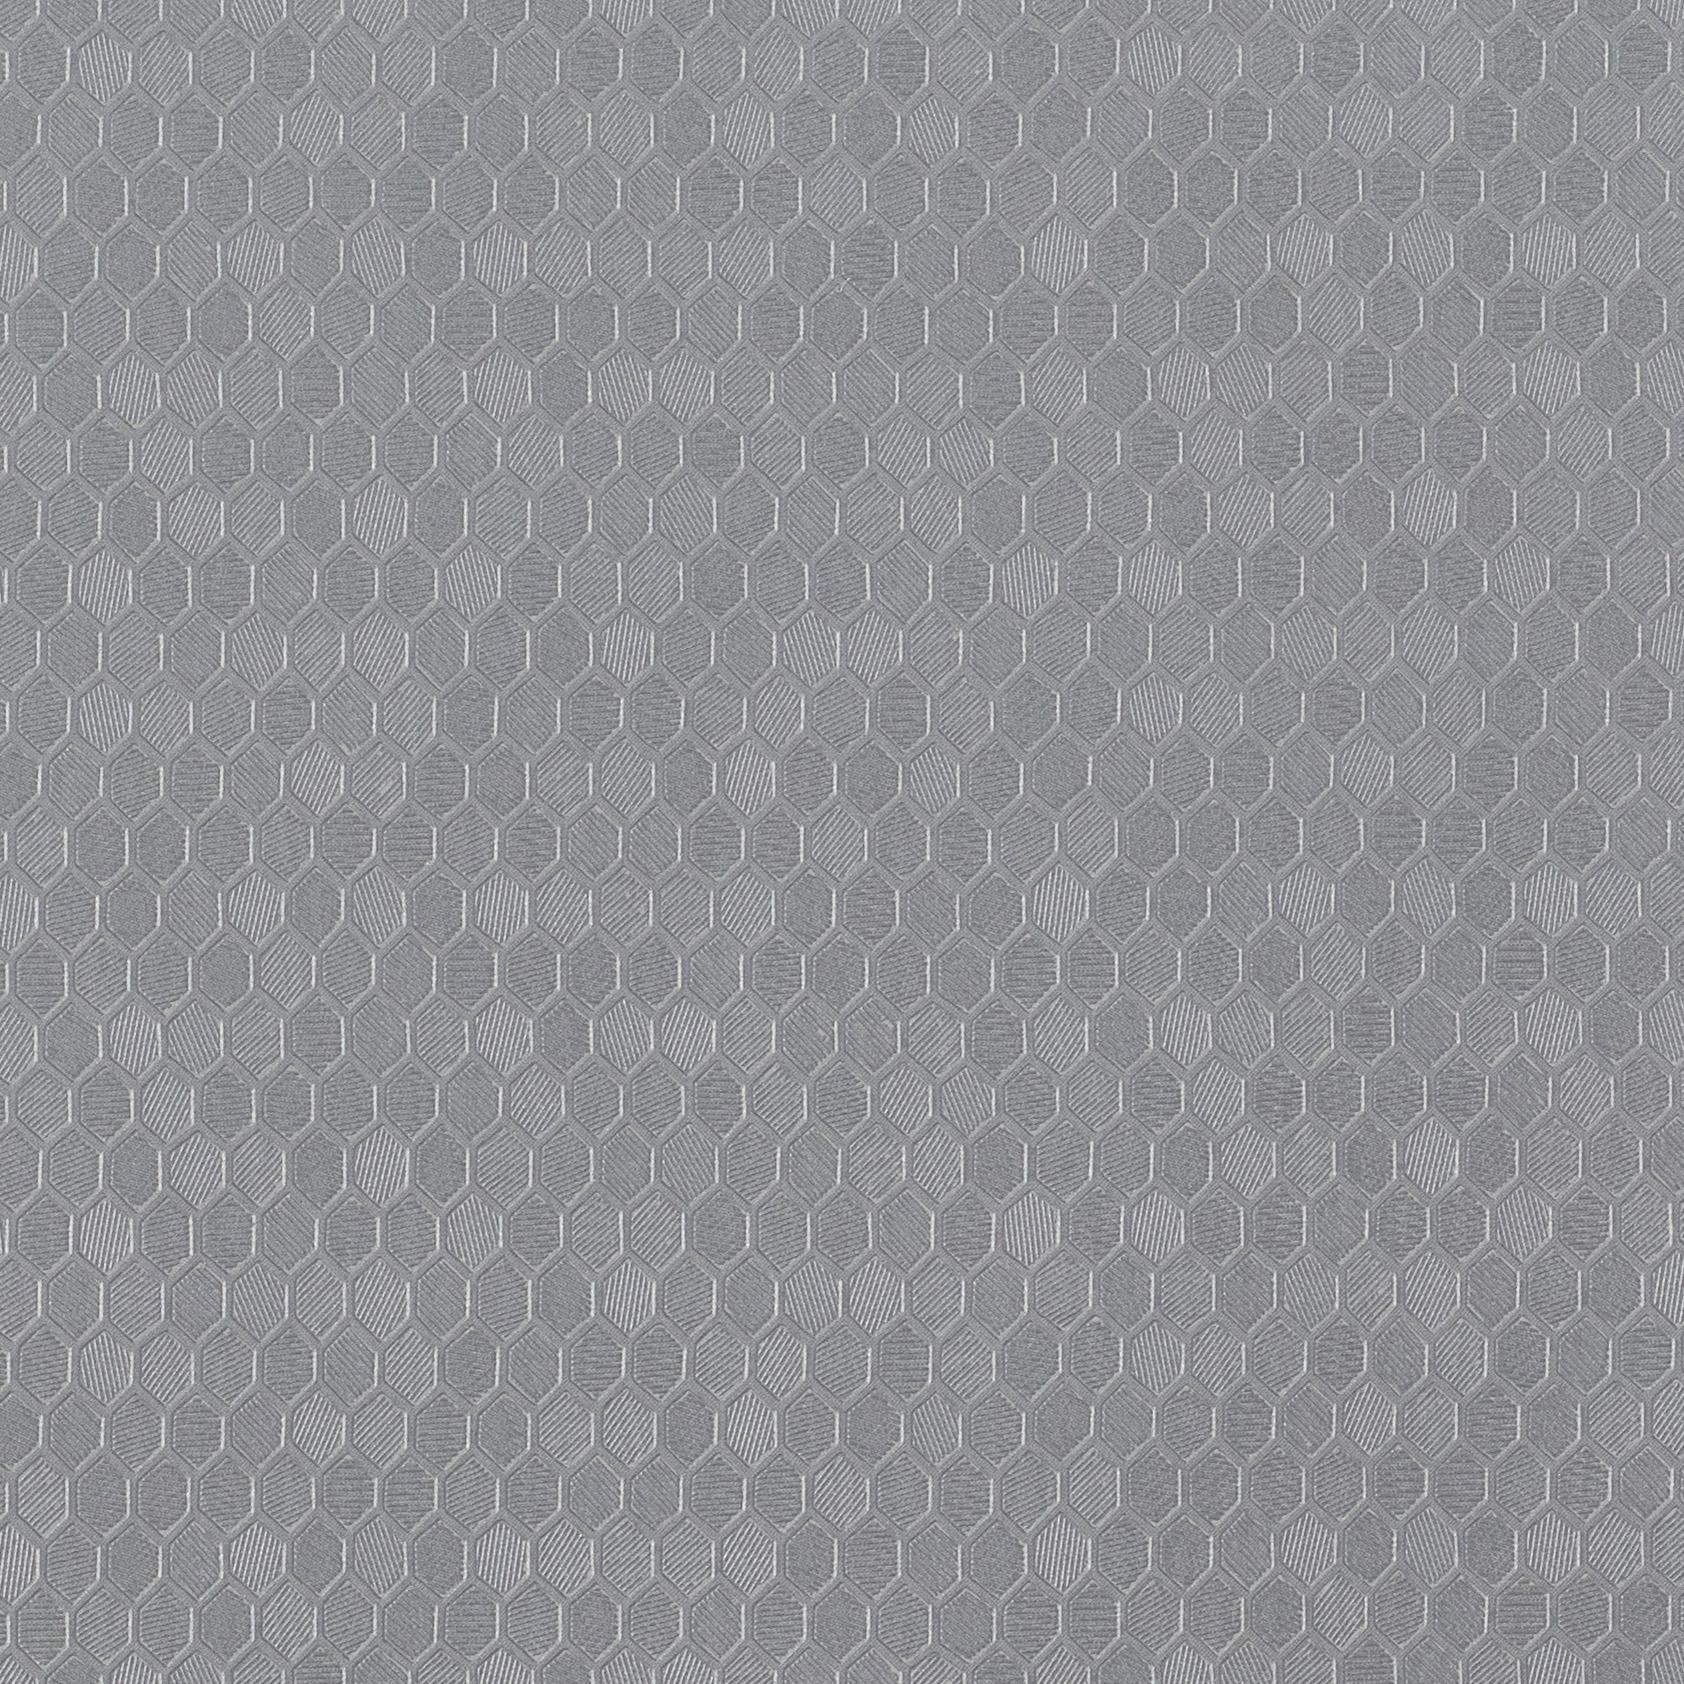 Hexx Silver Vinyl Fabric Jt S Outdoor Fabrics In Canada